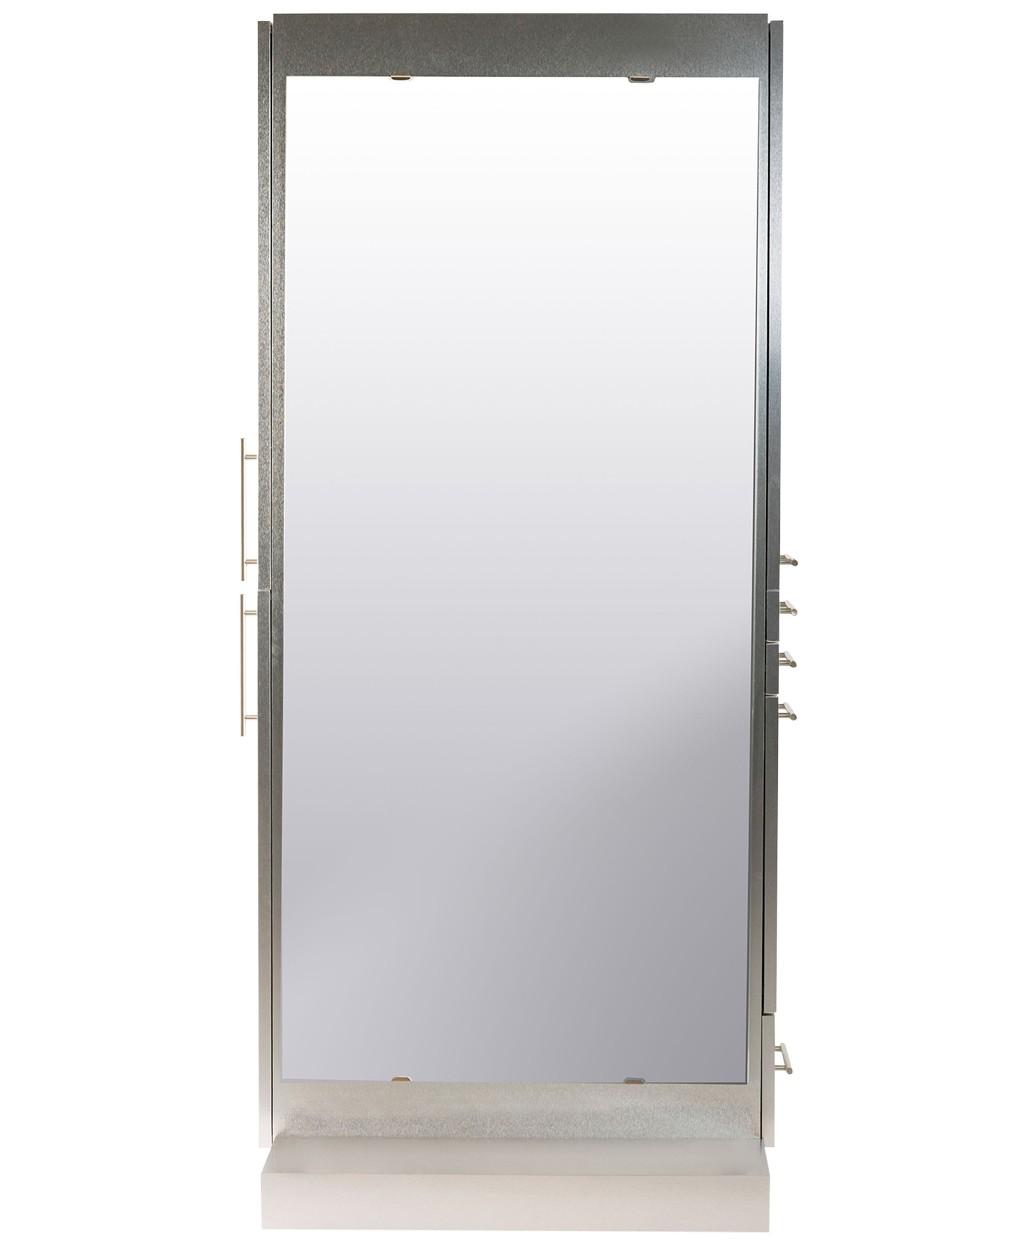 Omni Platinum Styling Station w/ Mobile Base